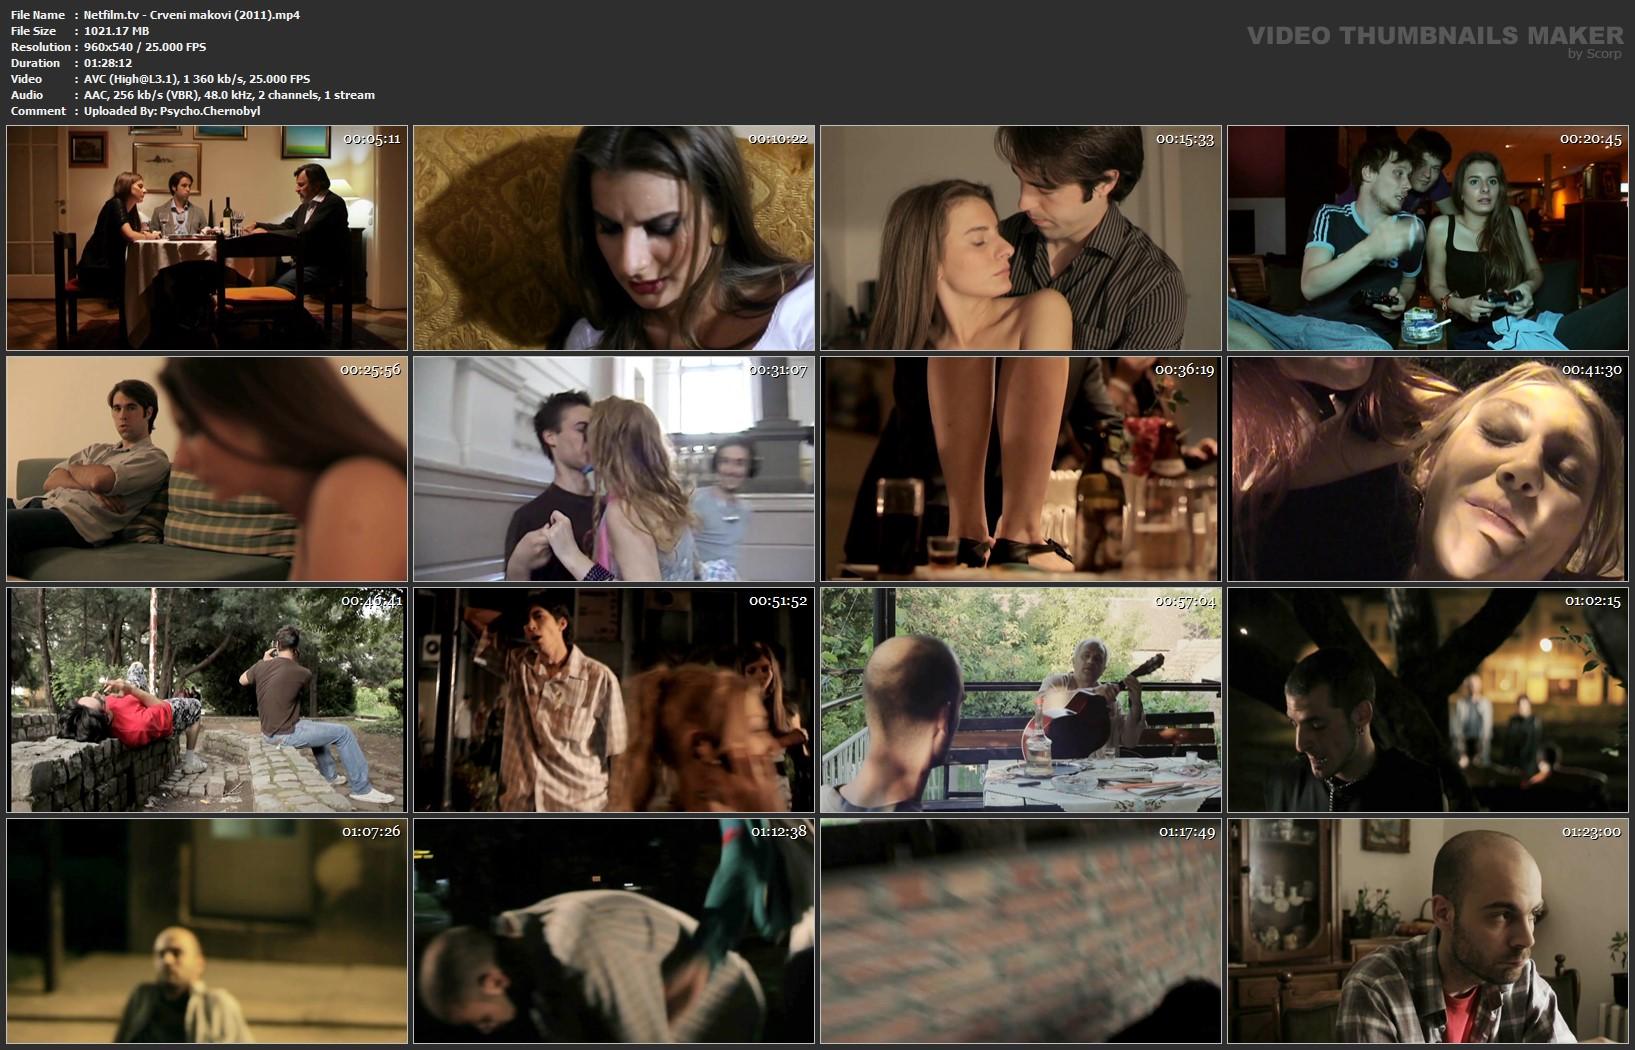 Netfilm-tv-Crveni-makovi-2011-mp4.jpg